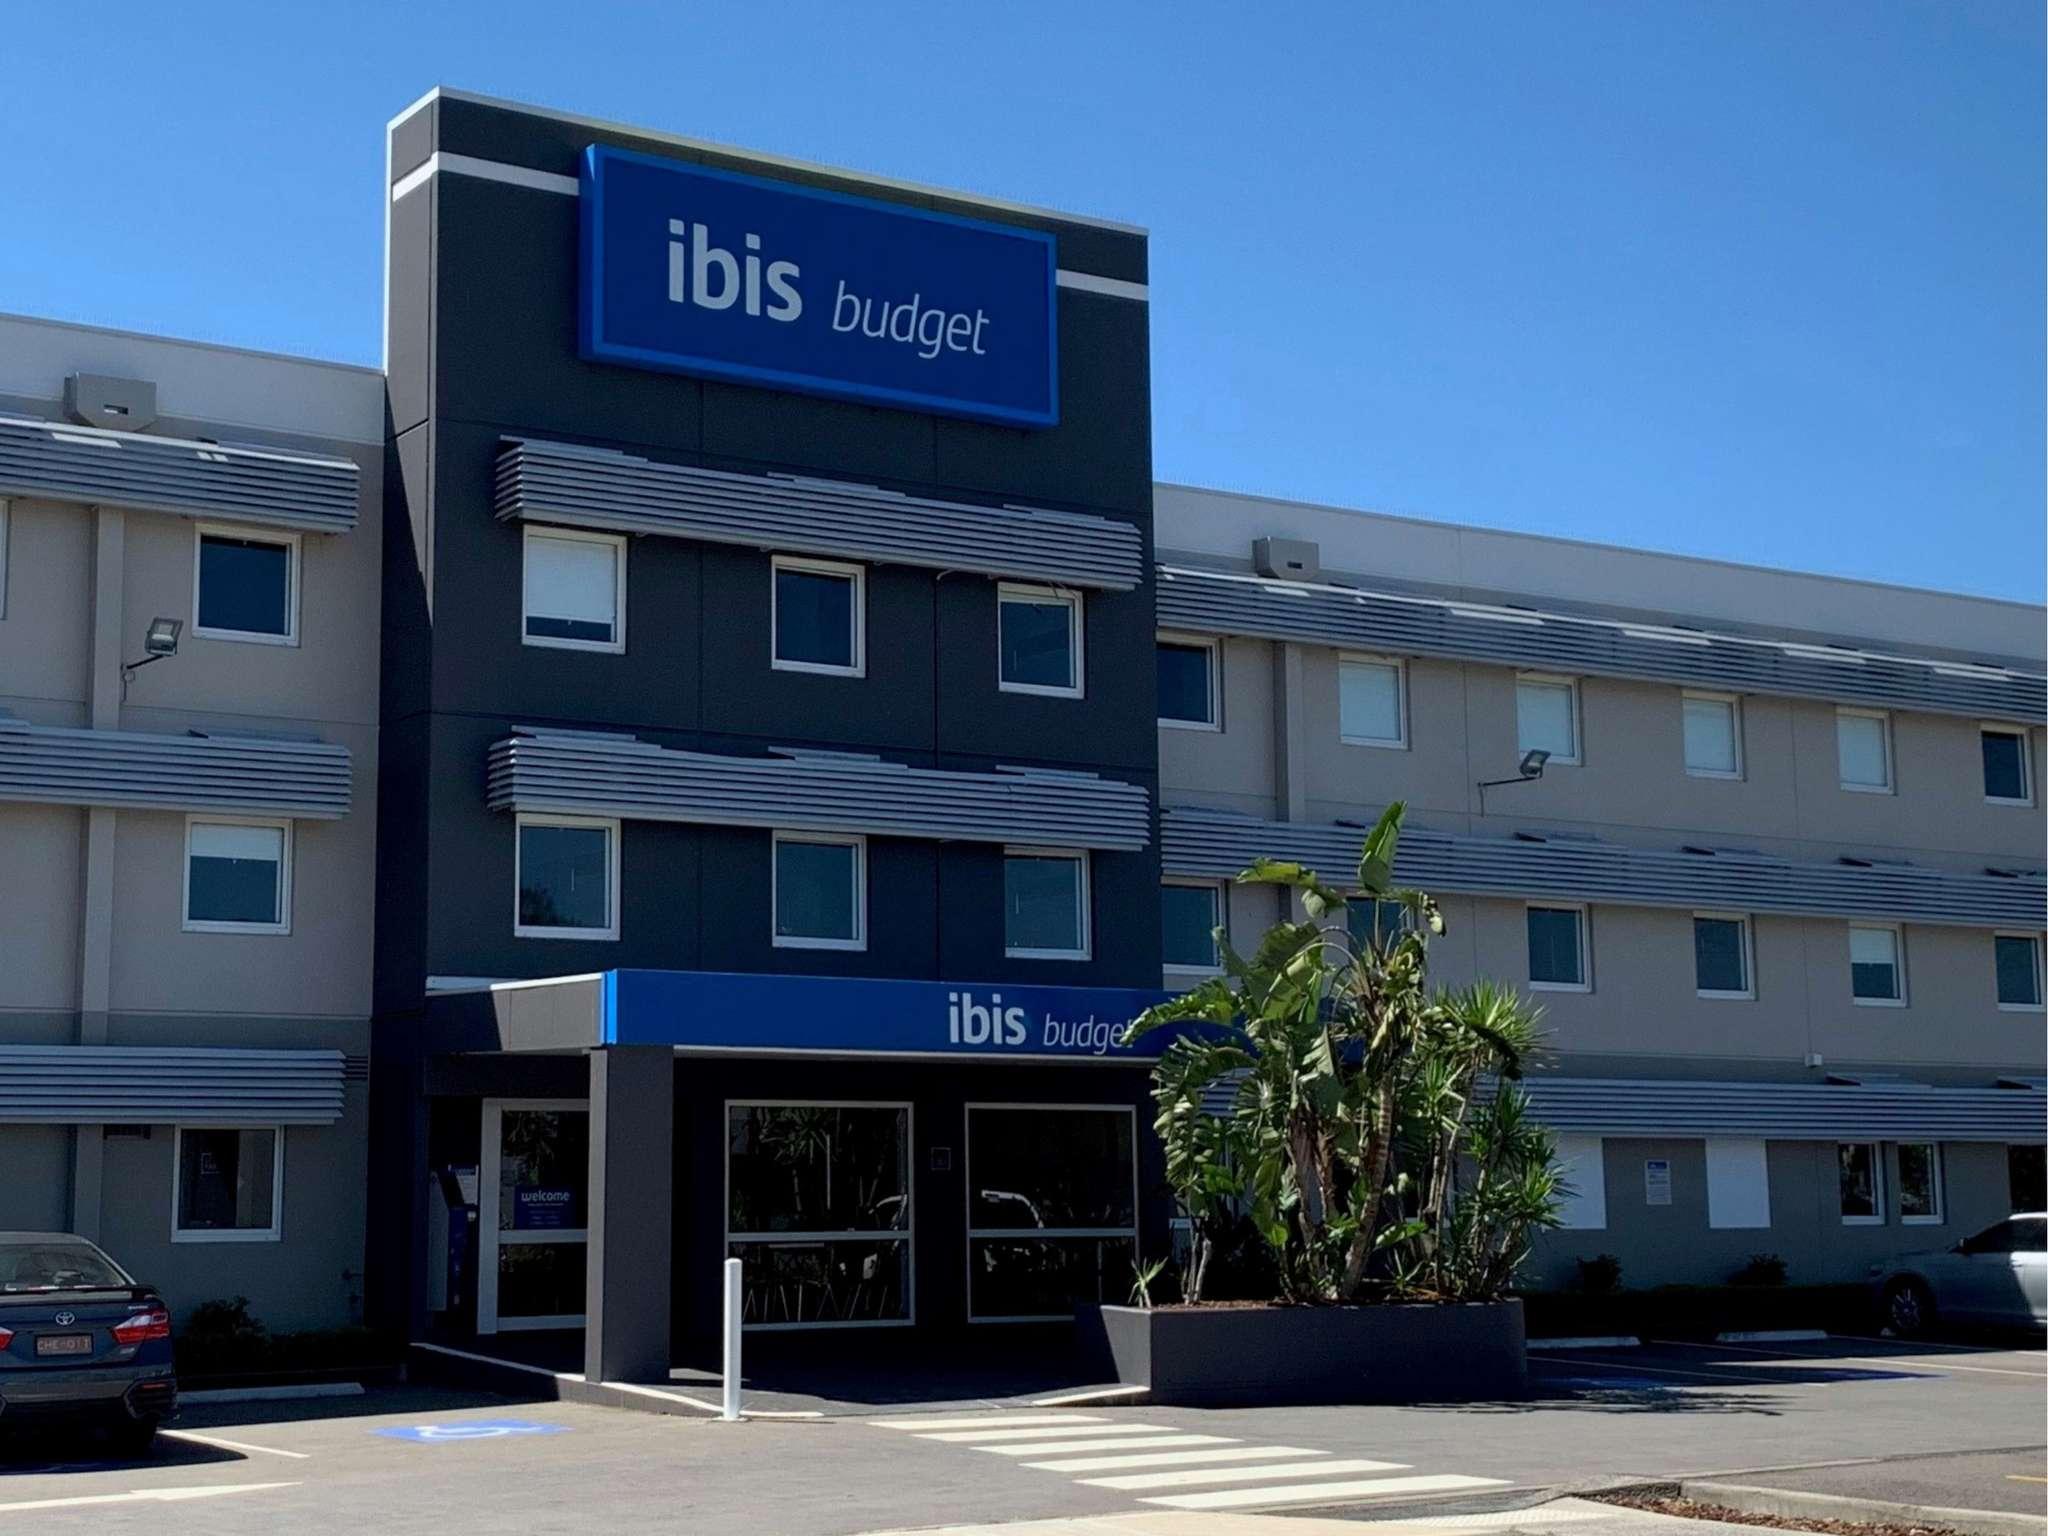 Ho home property management gosford - Hotel Ibis Budget Gosford